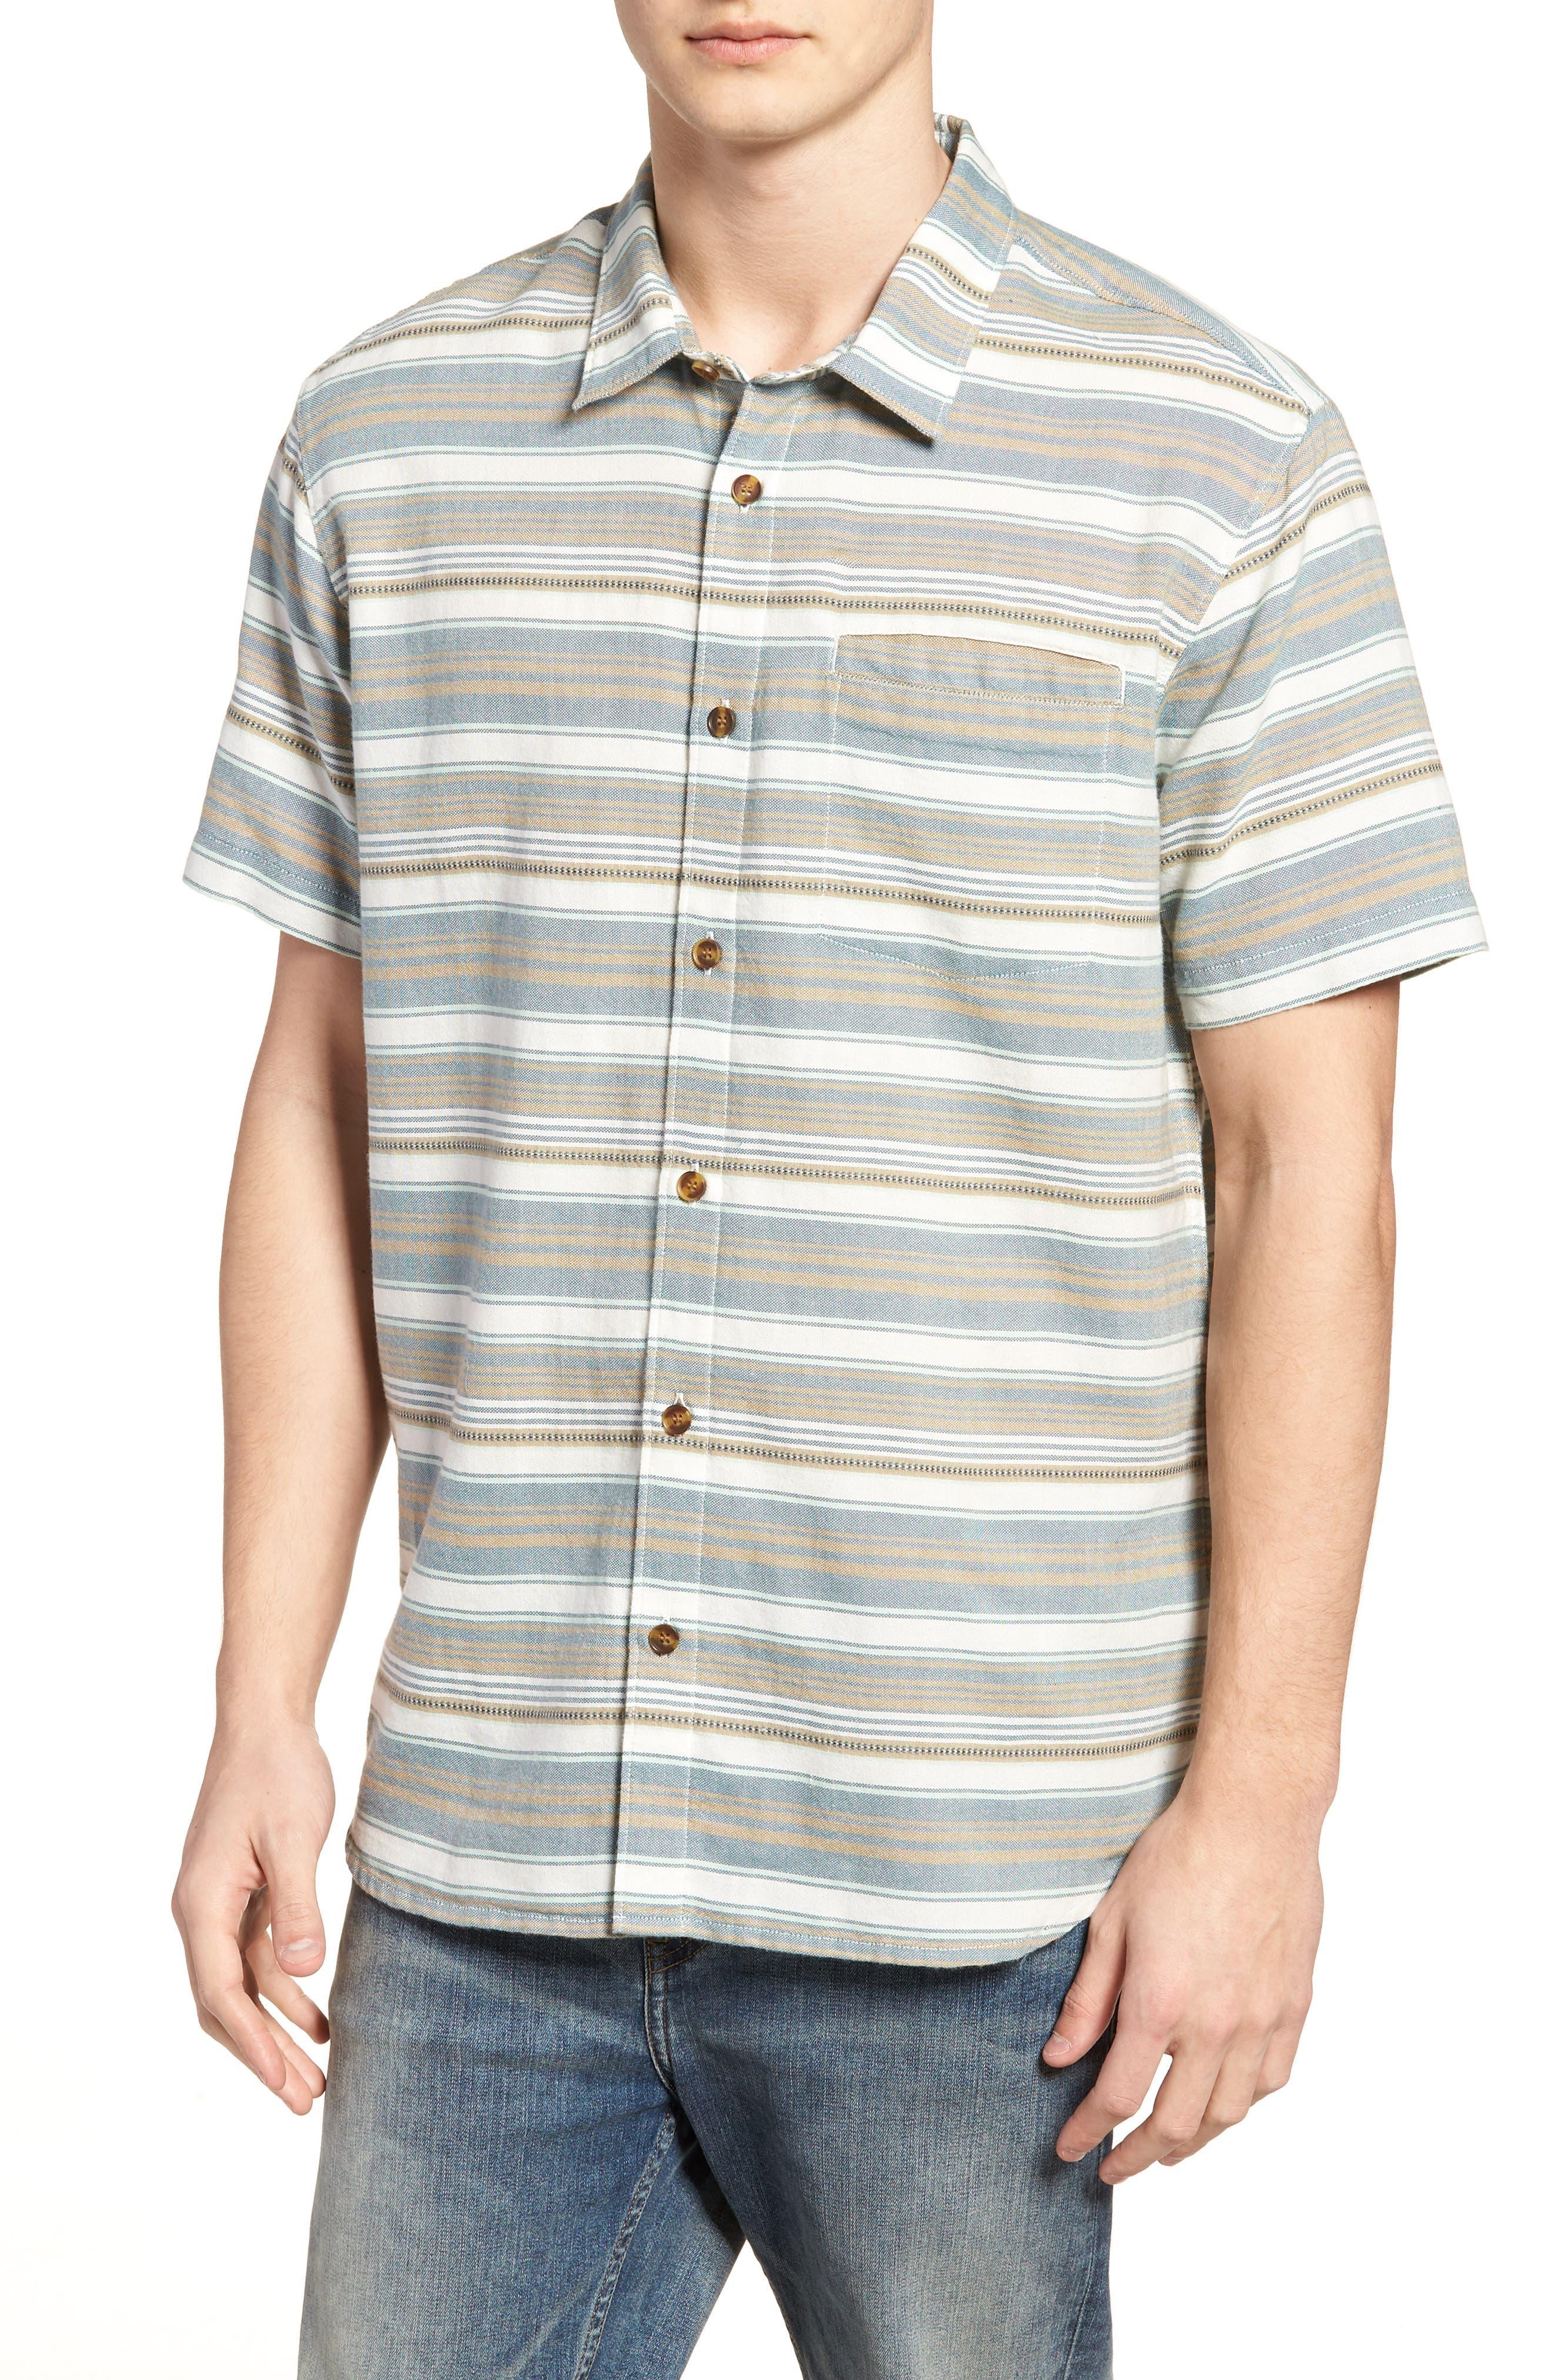 Currington Short Sleeve Shirt,                         Main,                         color, Khaki